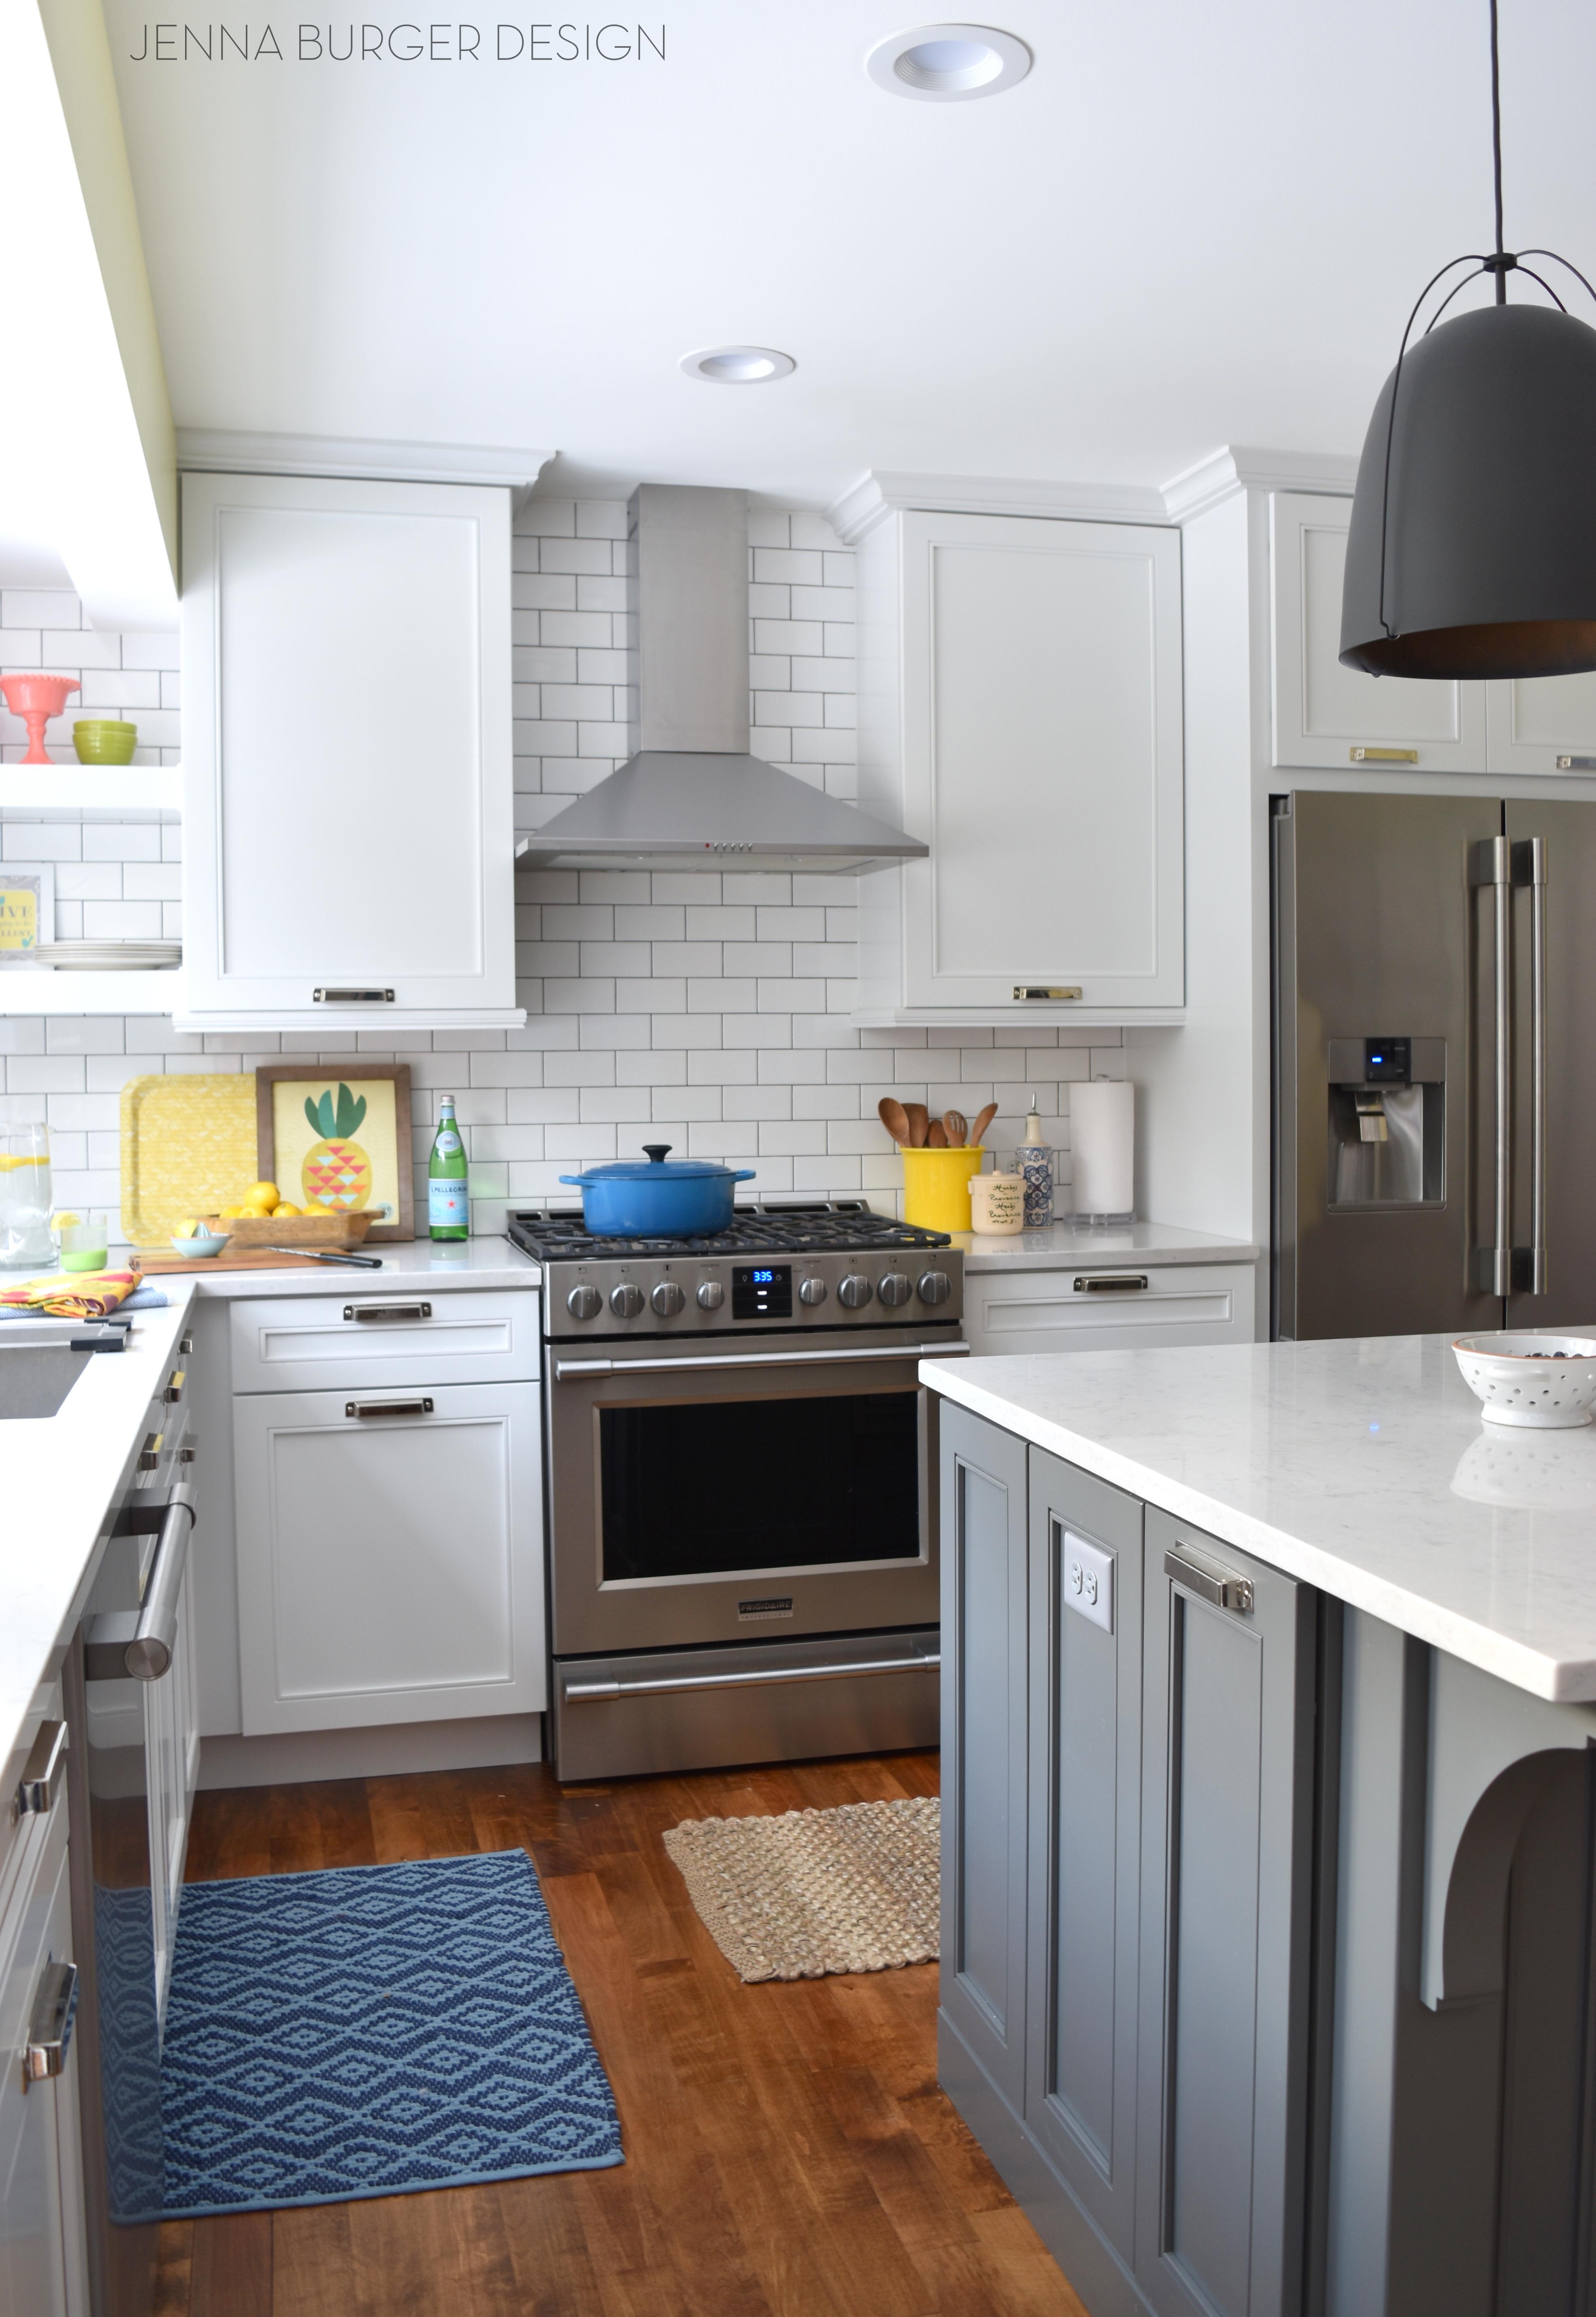 Choosing kitchen appliances jenna burger for Types of kitchen appliances